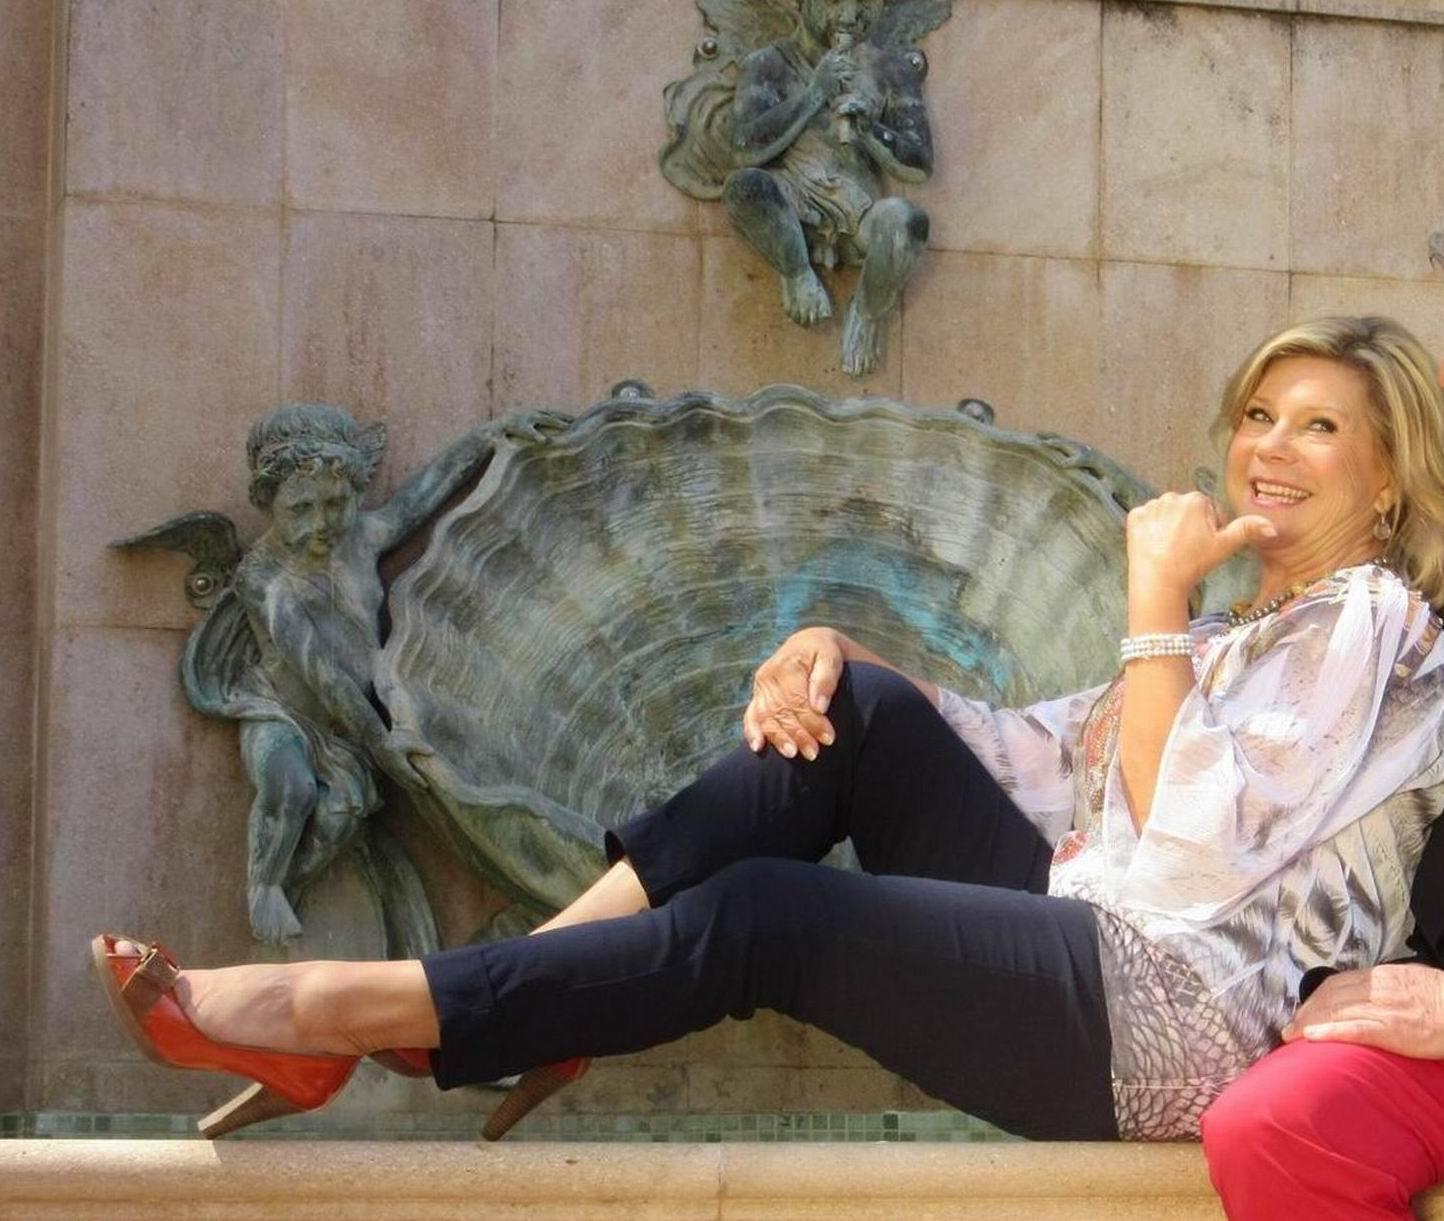 Marianne Hartl's Feet Olivia Wilde Imdb